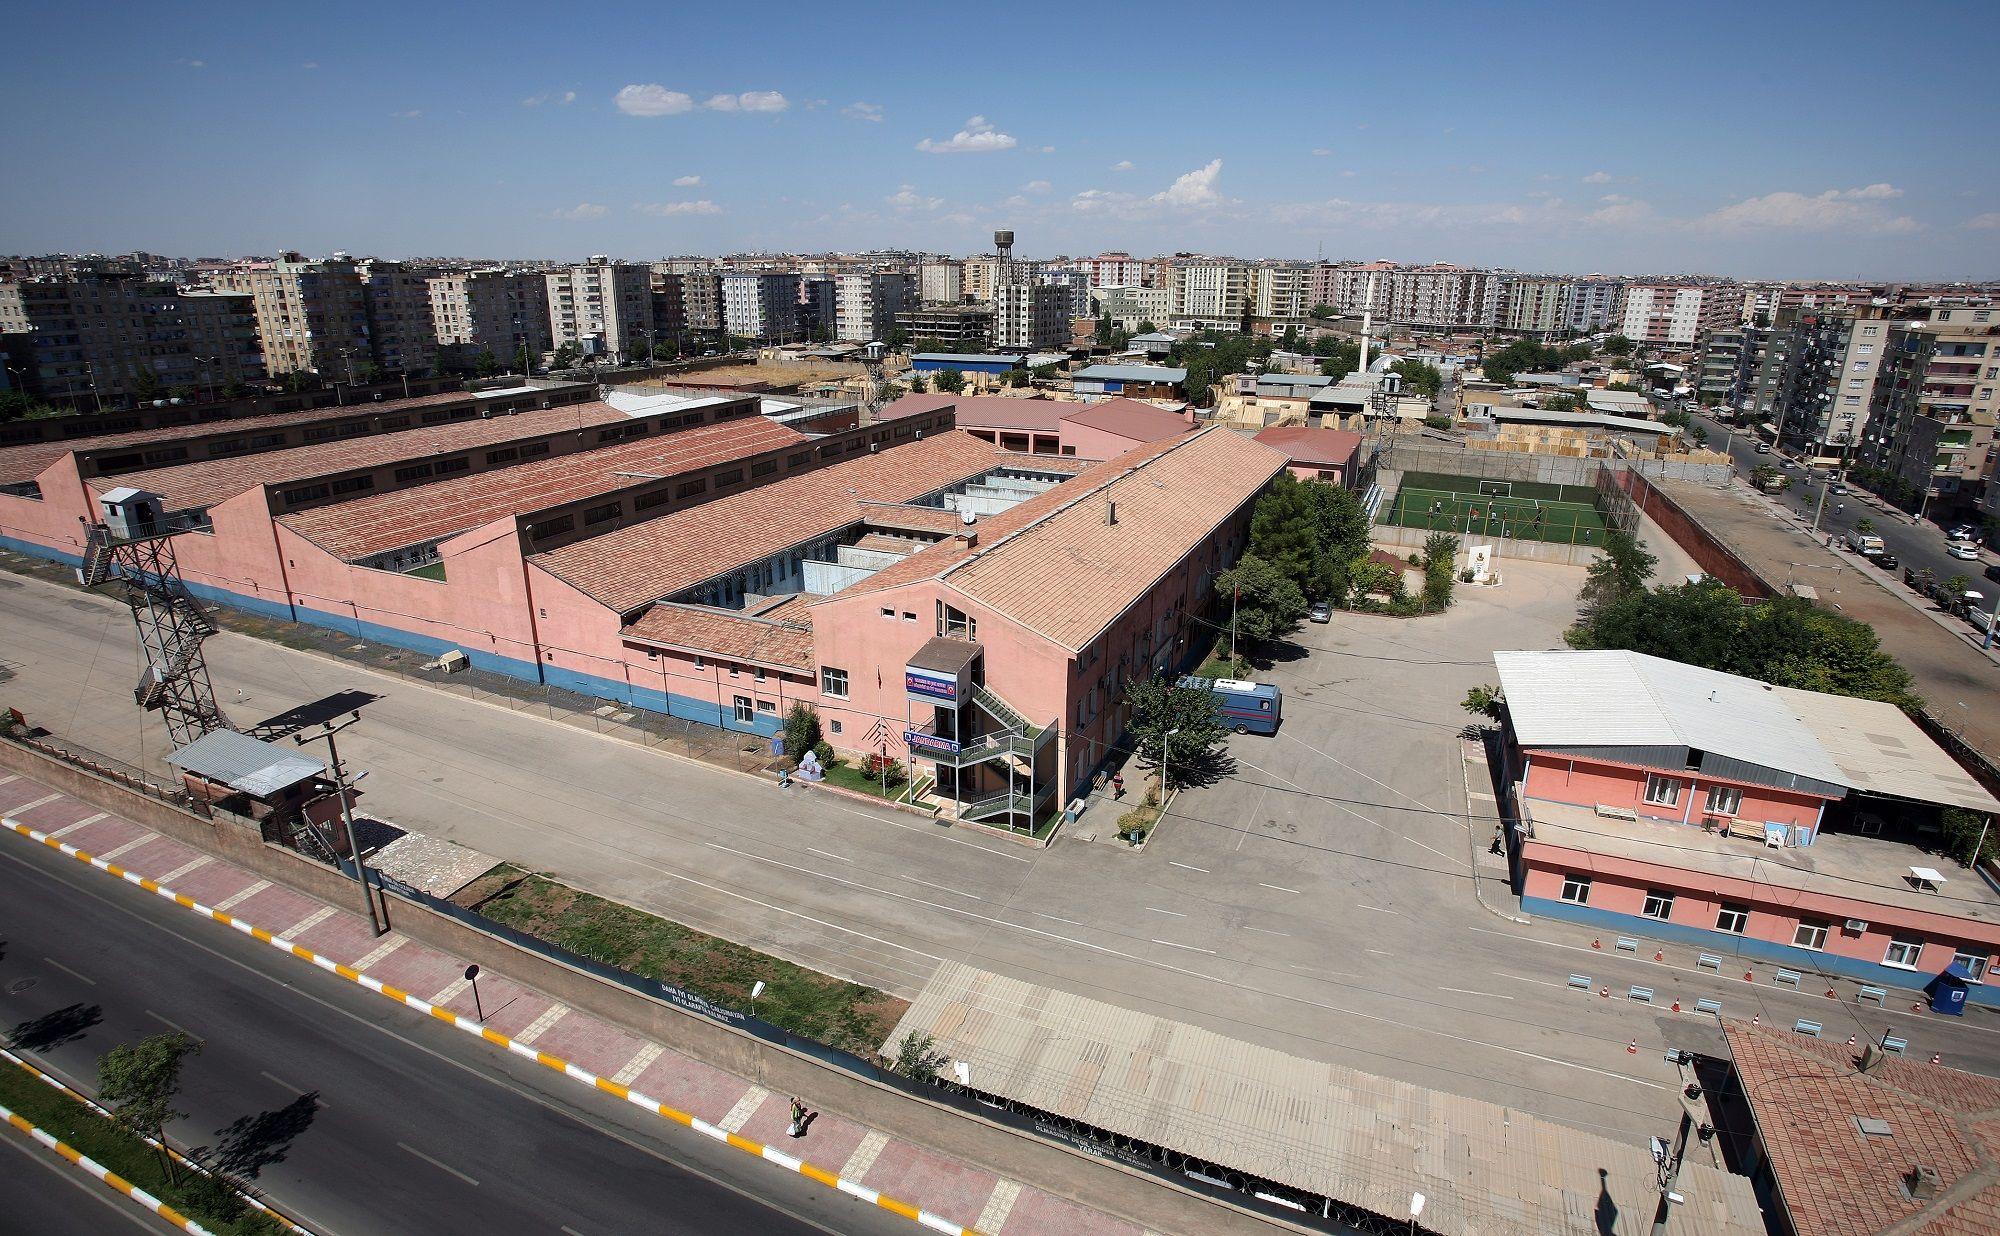 3. Diyarbakir Prison